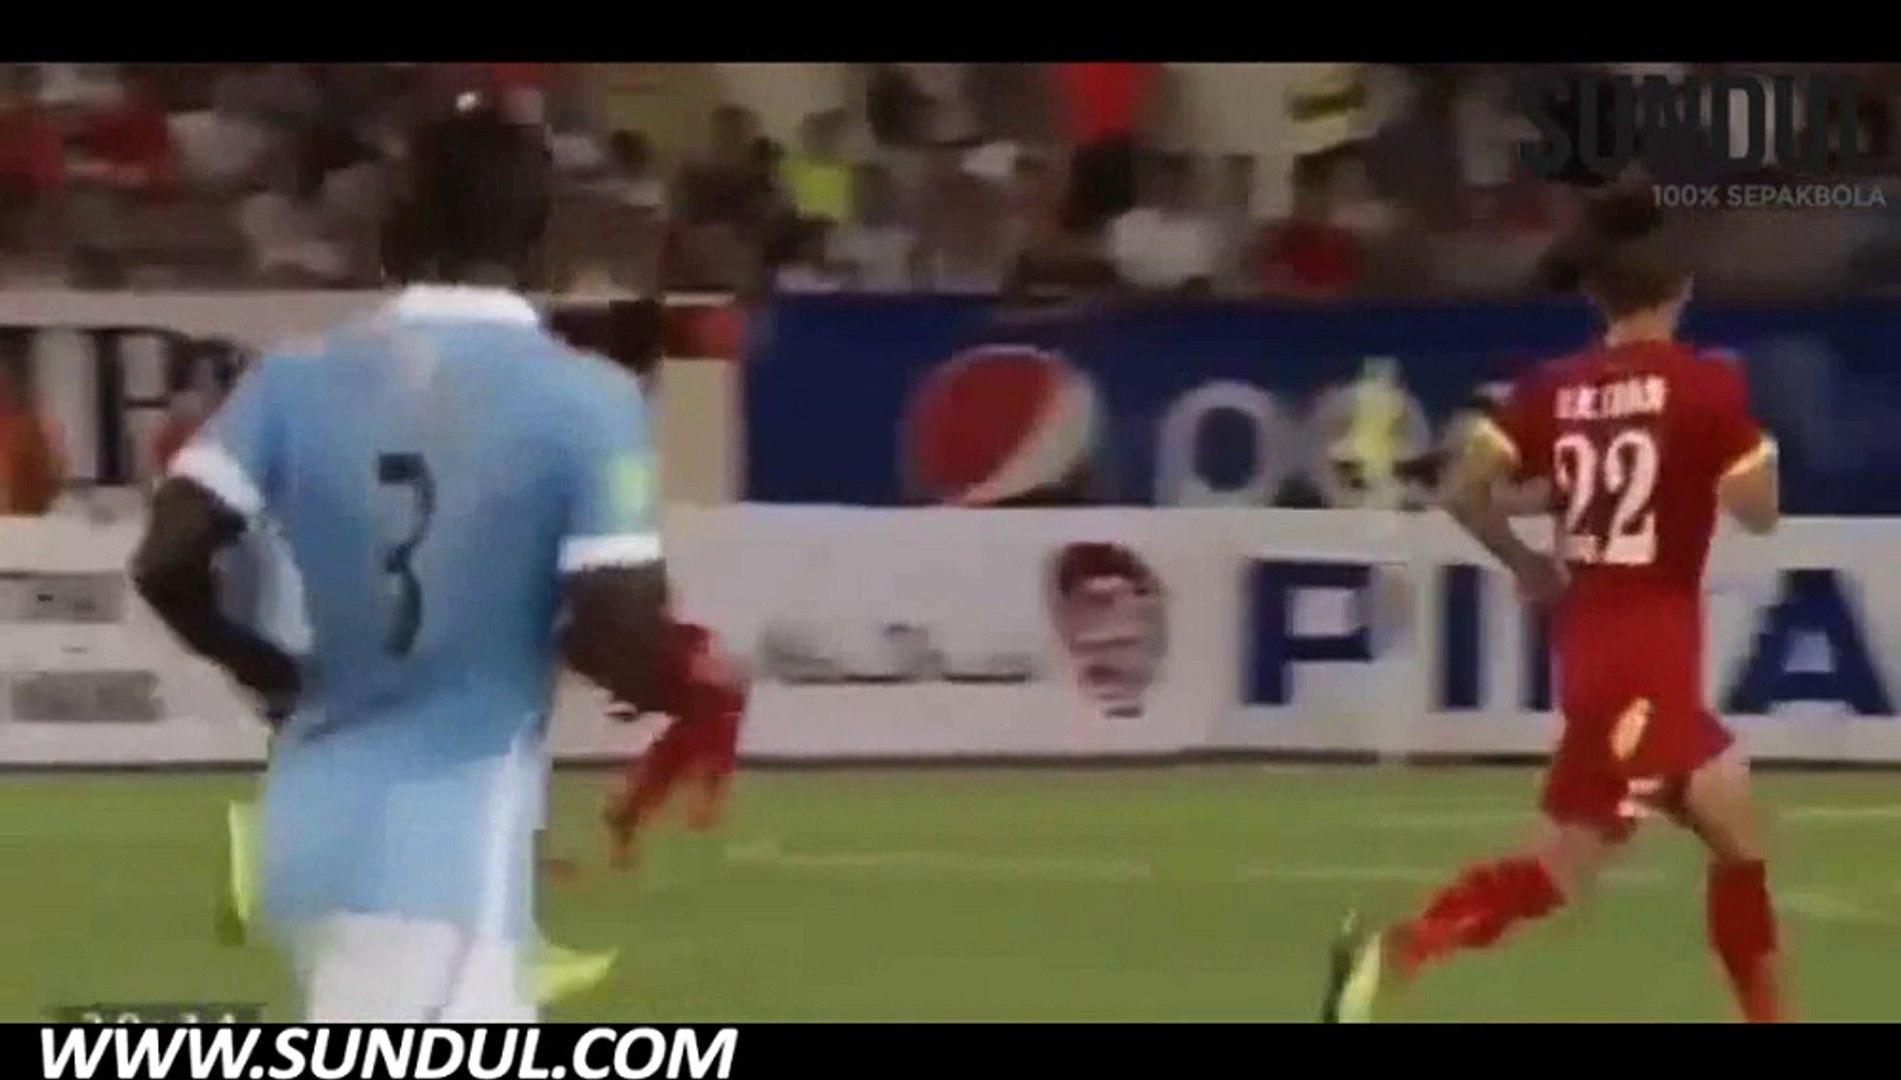 Friendly | Manchester City 8-1 Vietnam | Video bola, berita bola, cuplikan gol